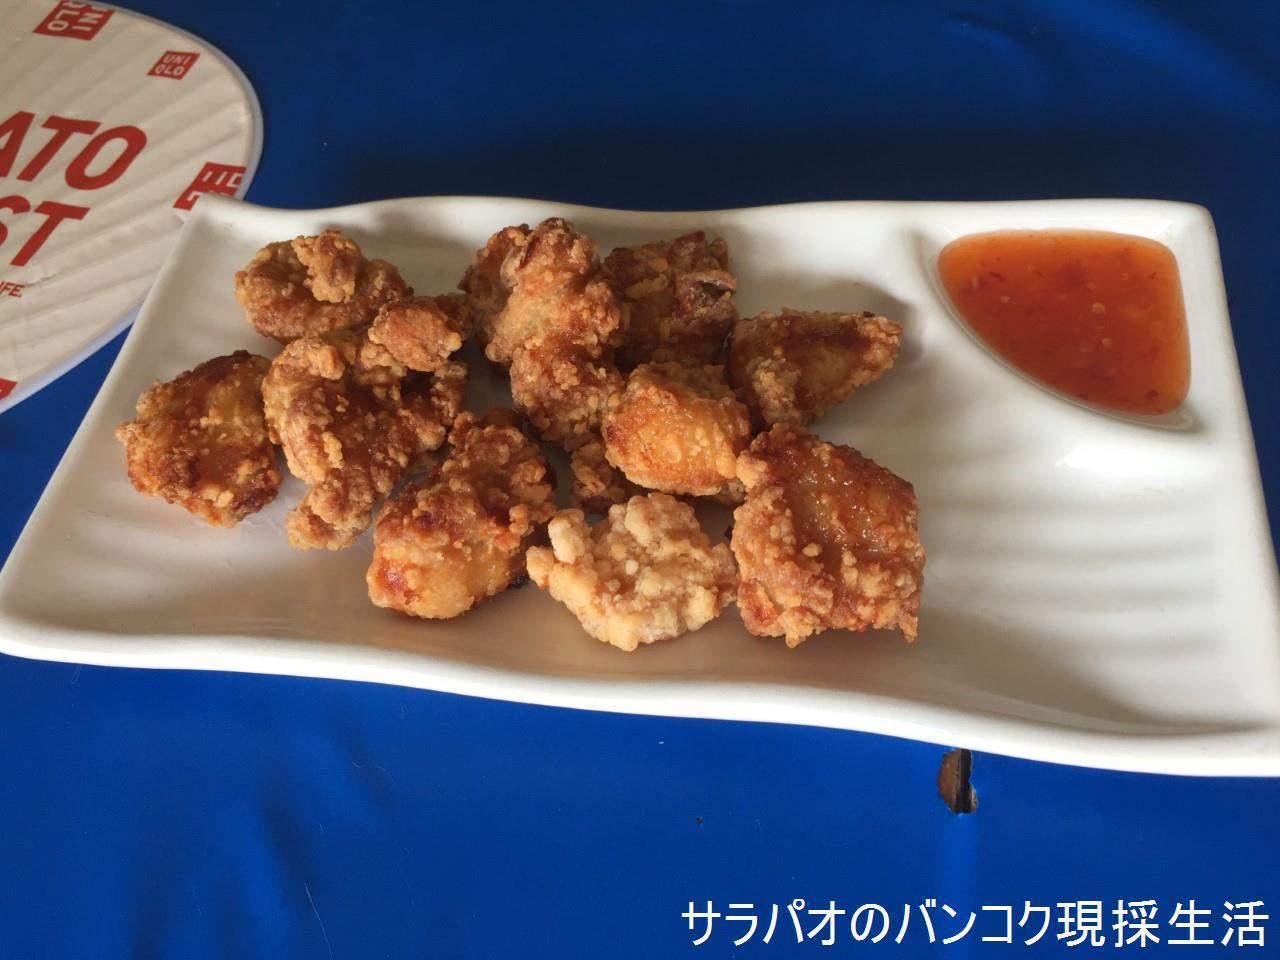 MenyaIchi_07.jpg